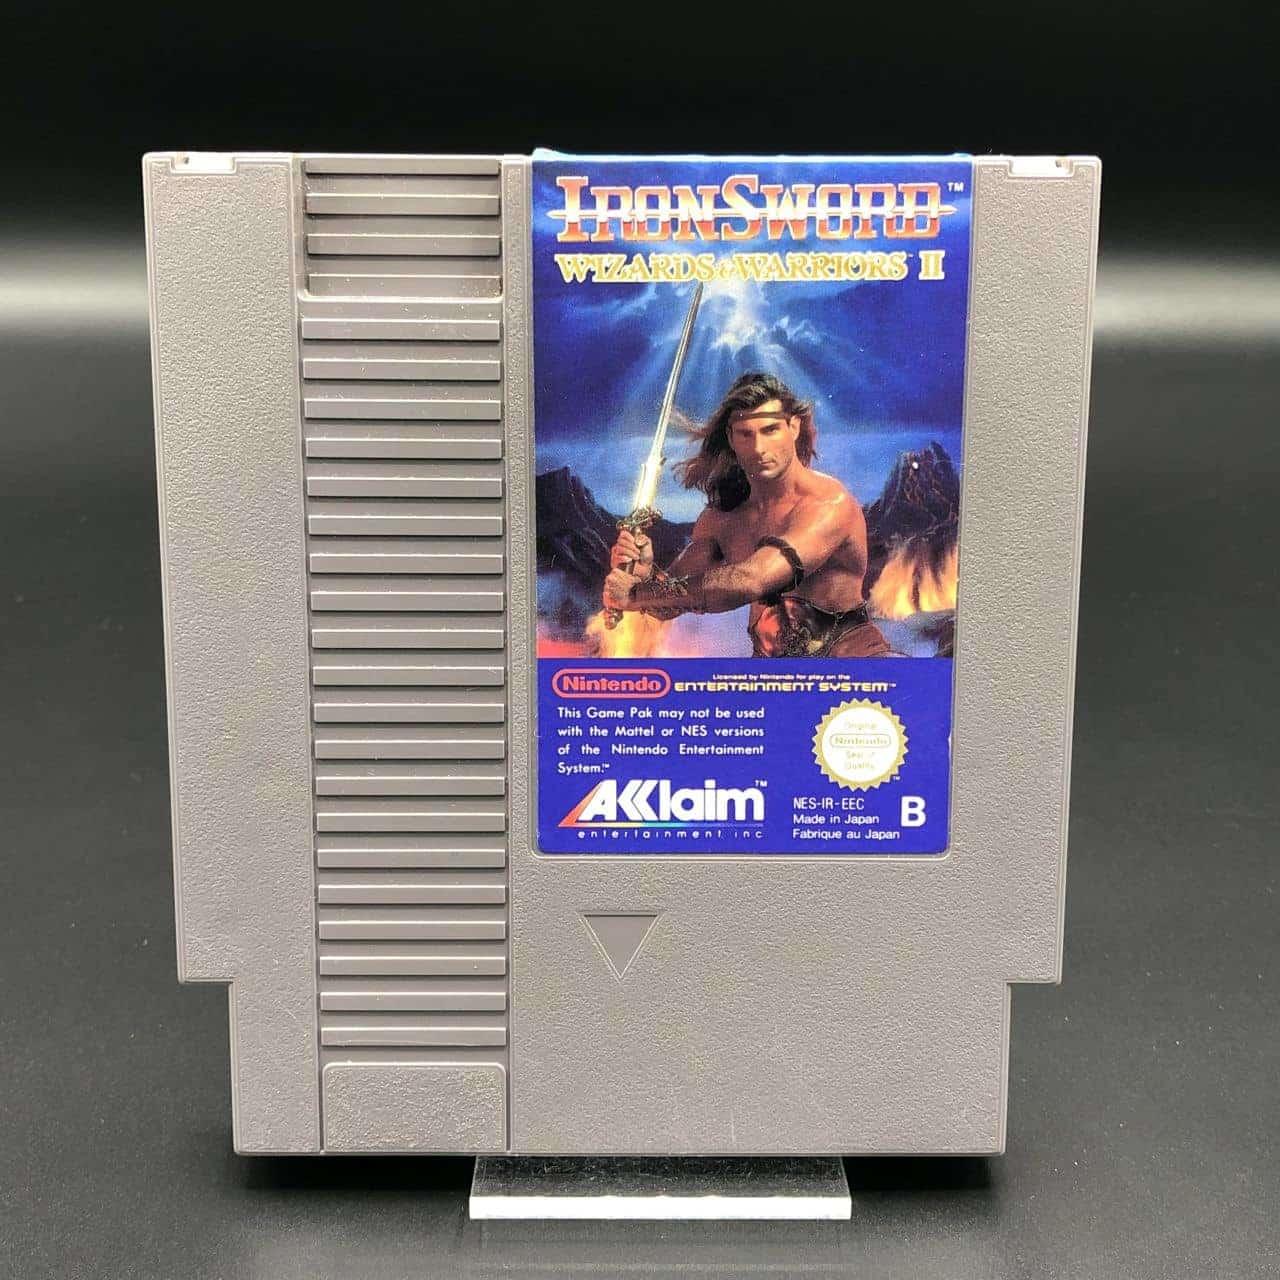 NES Ironsword: Wizards & Warriors II (Modul) (Gut) Nintendo Entertainment System #2